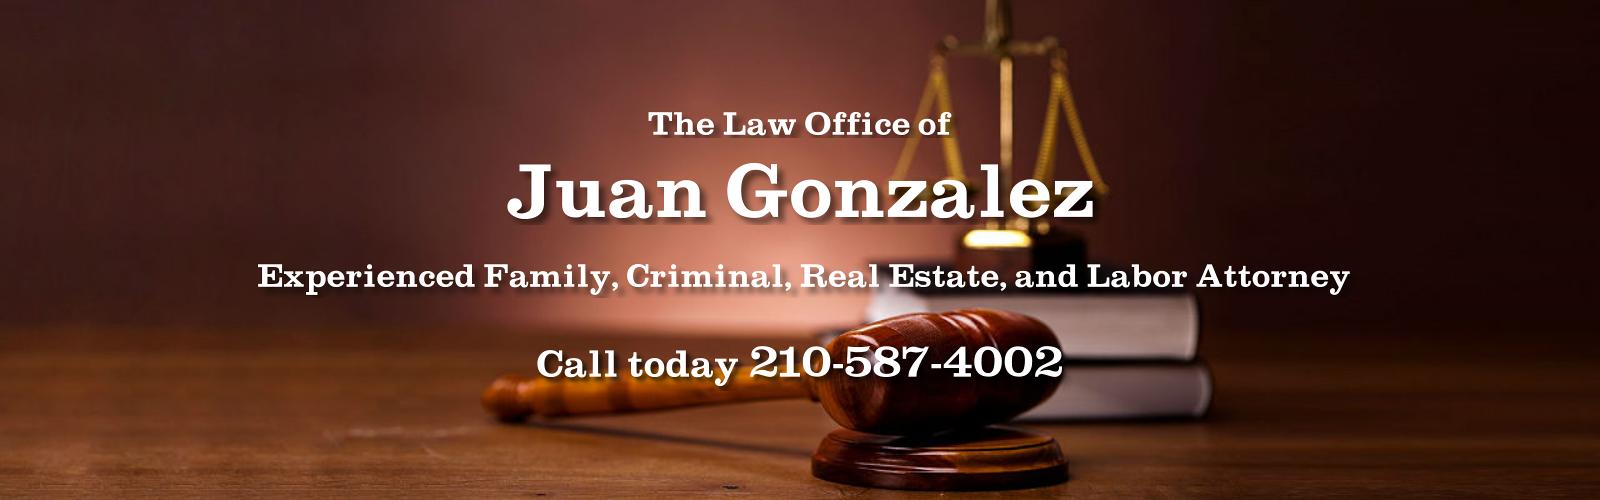 Juan Gonzalez Law